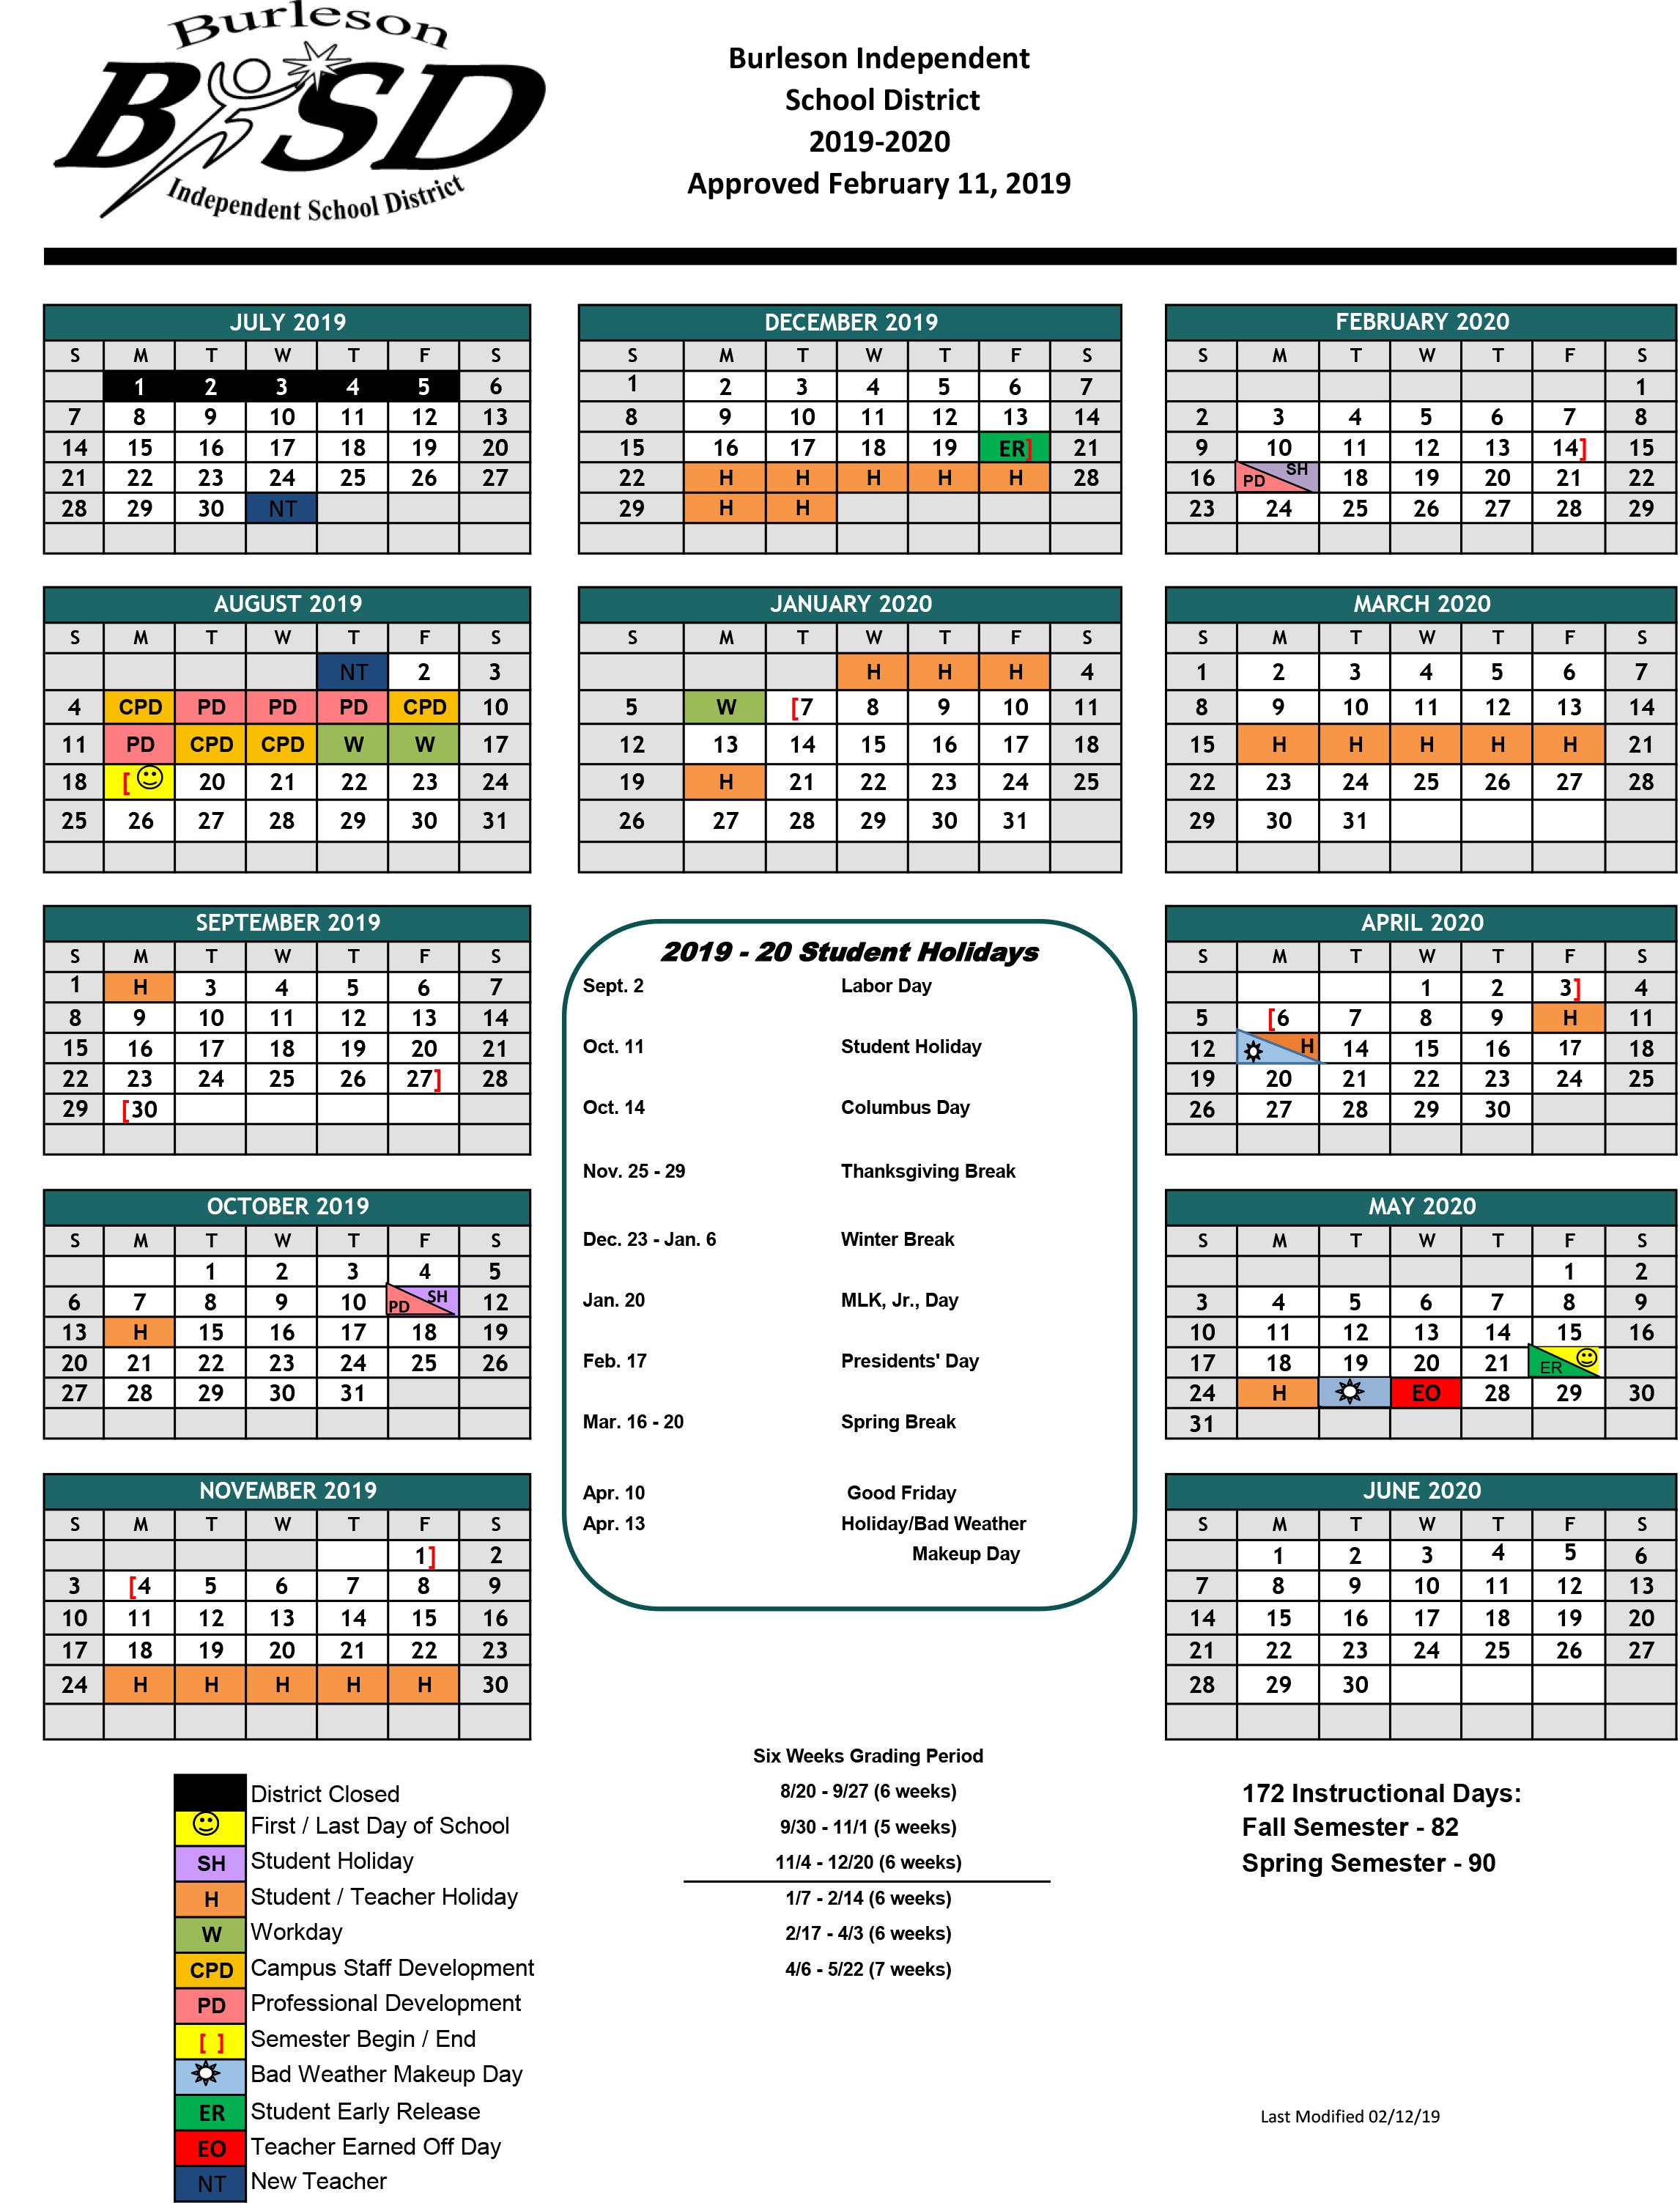 Educational Operations / Summer School For Brownsville Bisd School District Calendar